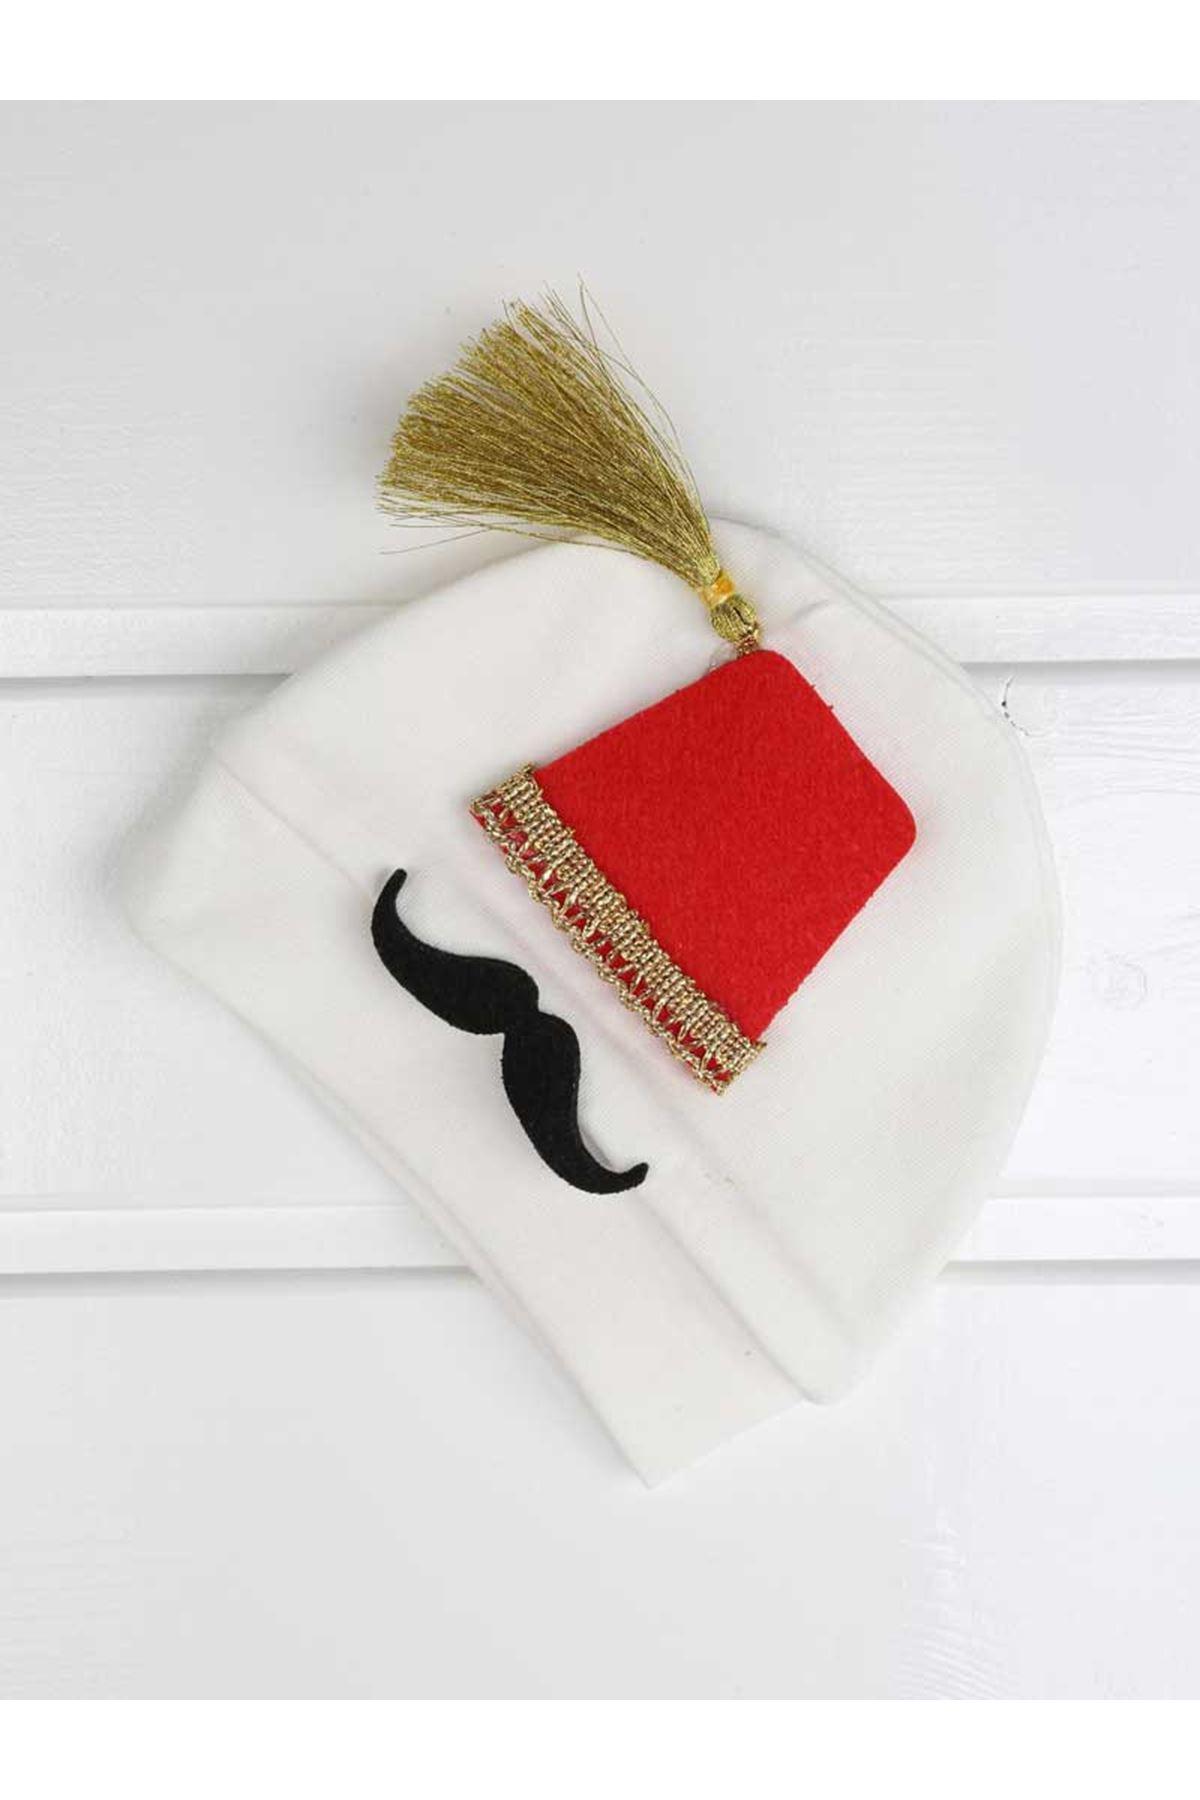 White Baby Rompers Suit Boy Ottoman Fez Newborn Clothes 4 pcs set cotton soft Boys clothing models for babies